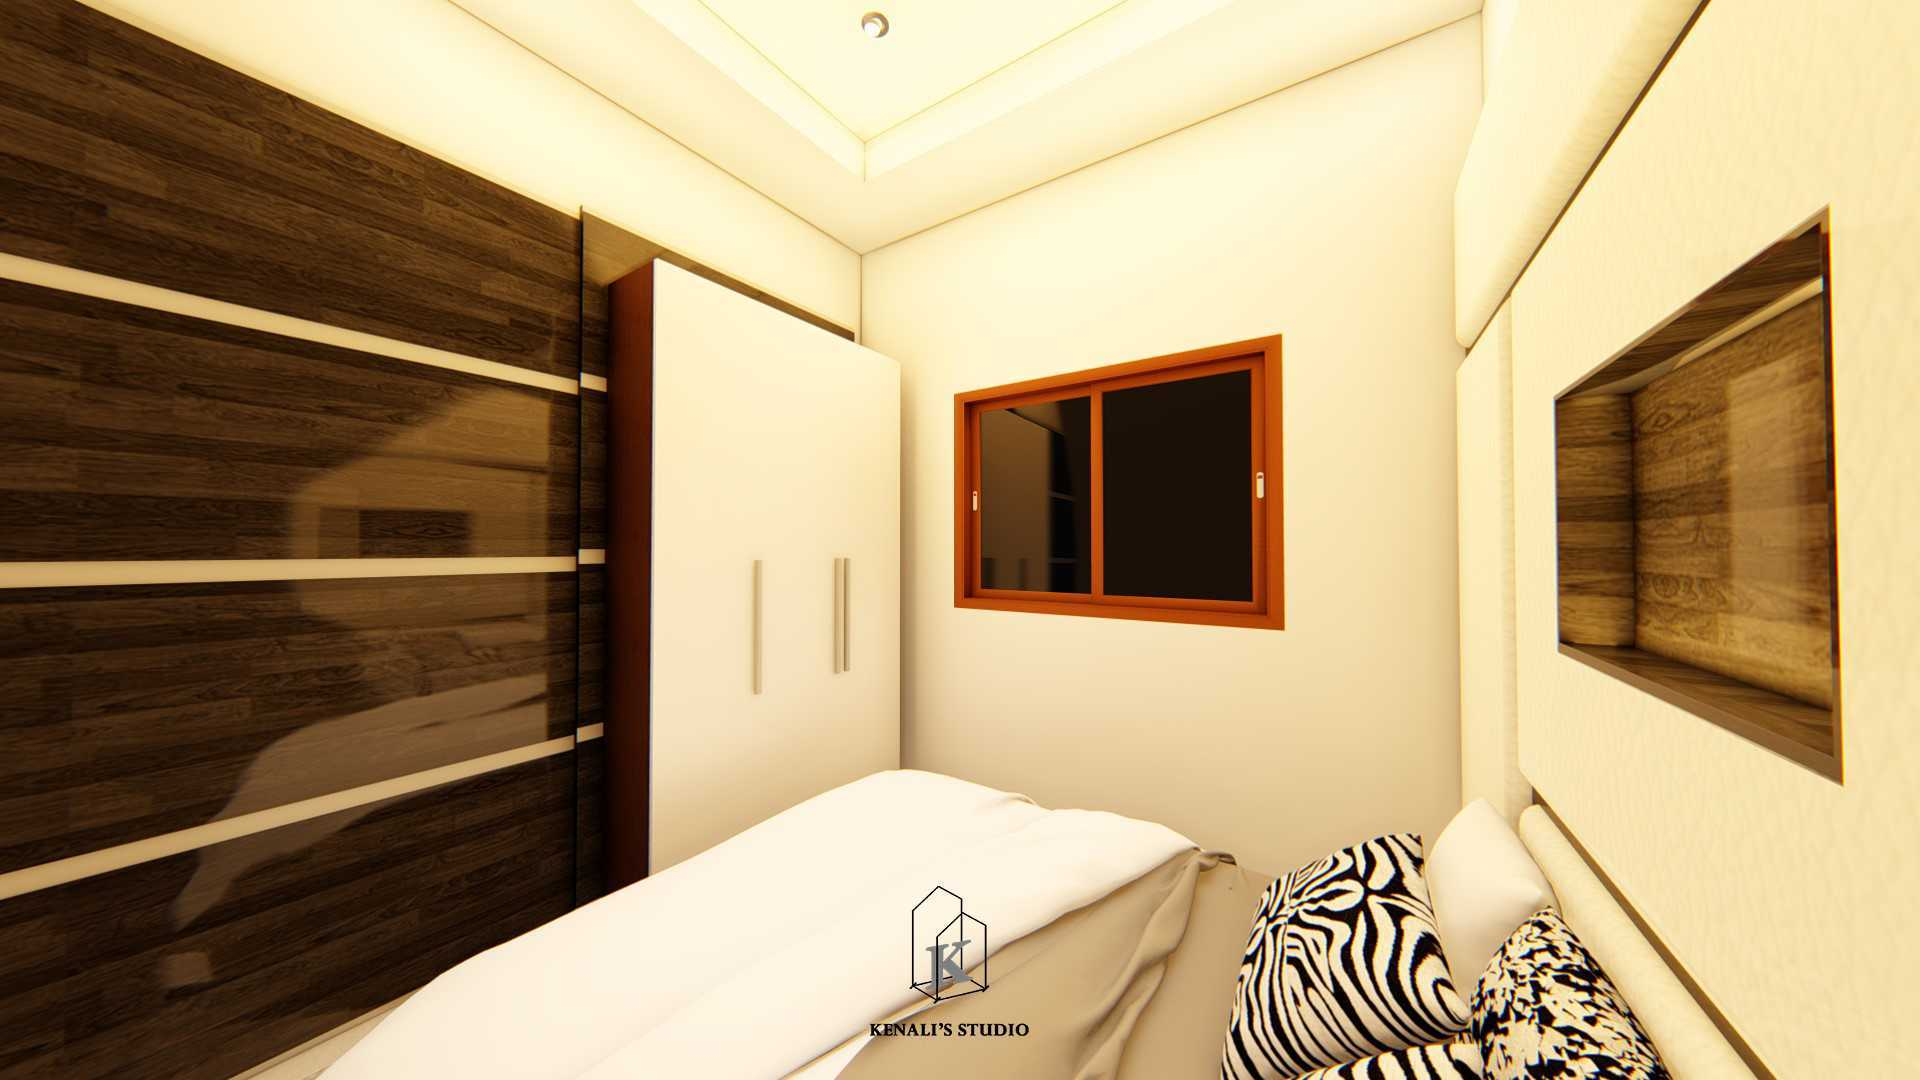 "Kenali's Studio ""chronicles Of Joglo"" A - House Salatiga, Kota Salatiga, Jawa Tengah, Indonesia Salatiga, Kota Salatiga, Jawa Tengah, Indonesia Kenalis-Studio-Chronicles-Of-Joglo-A-House   66939"